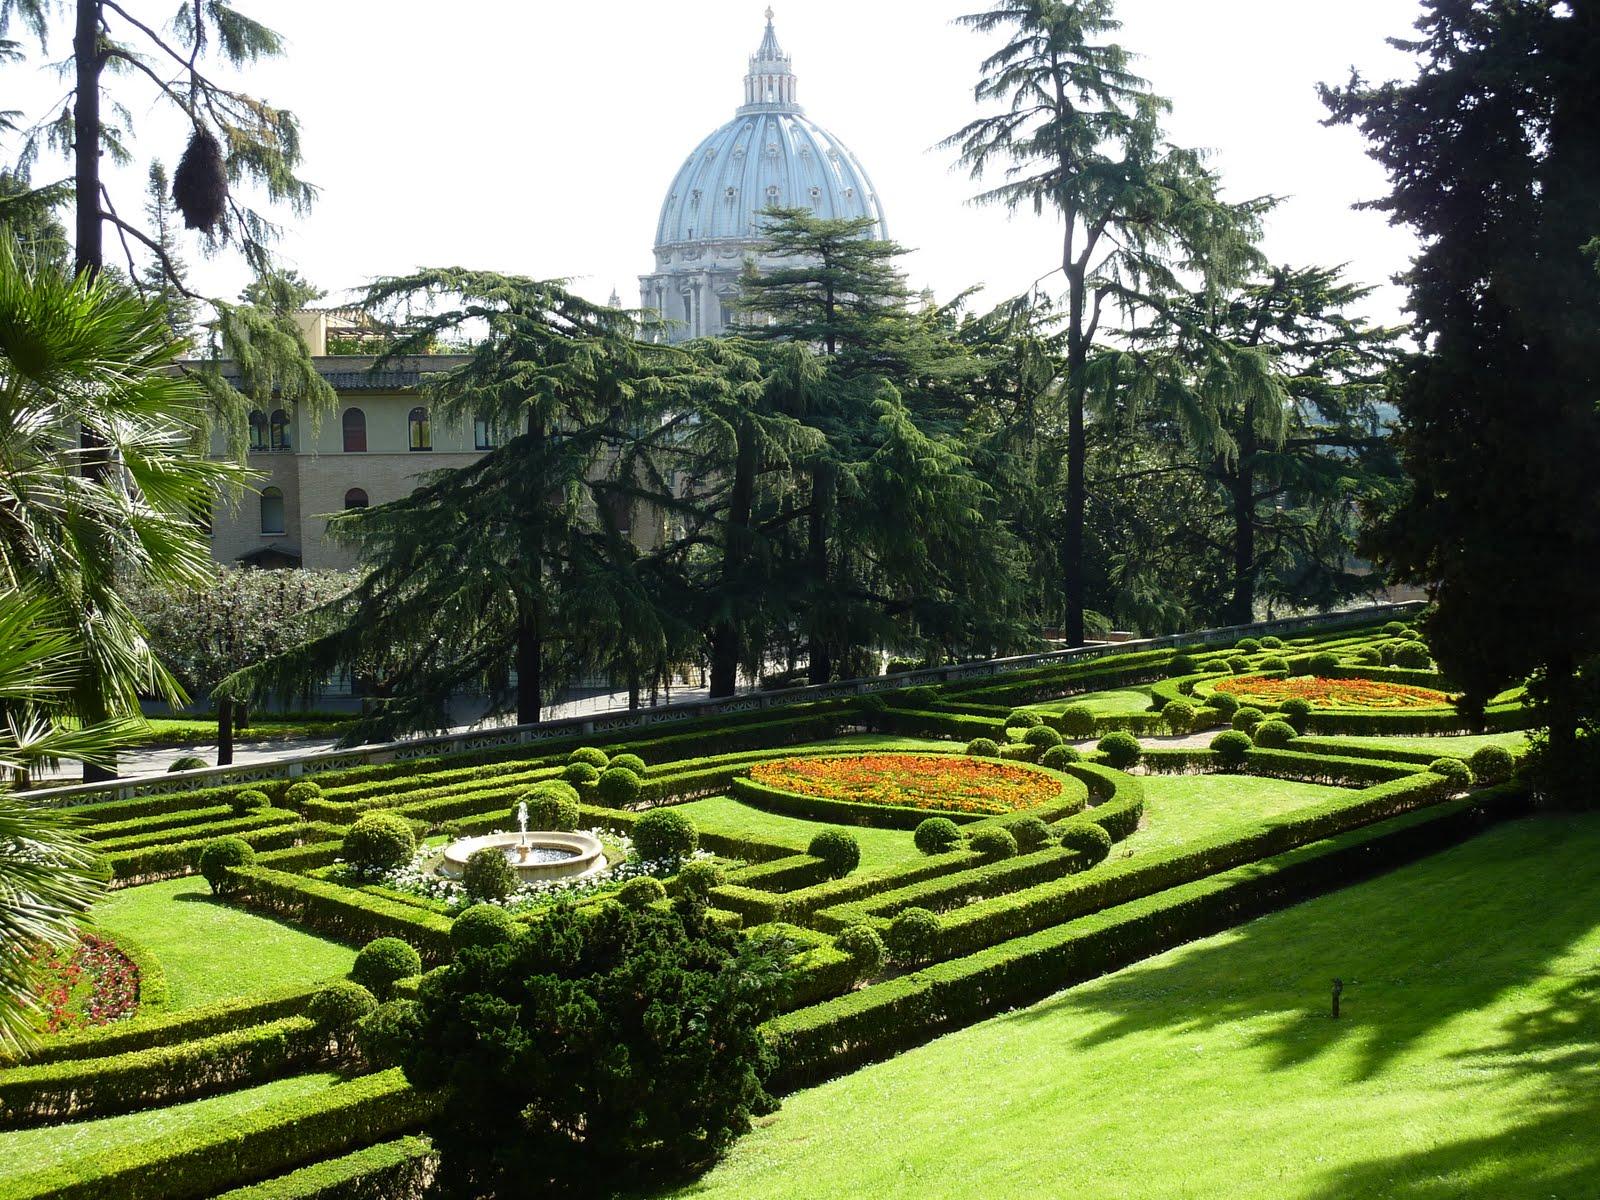 exclusive vatican gardens tour. Black Bedroom Furniture Sets. Home Design Ideas